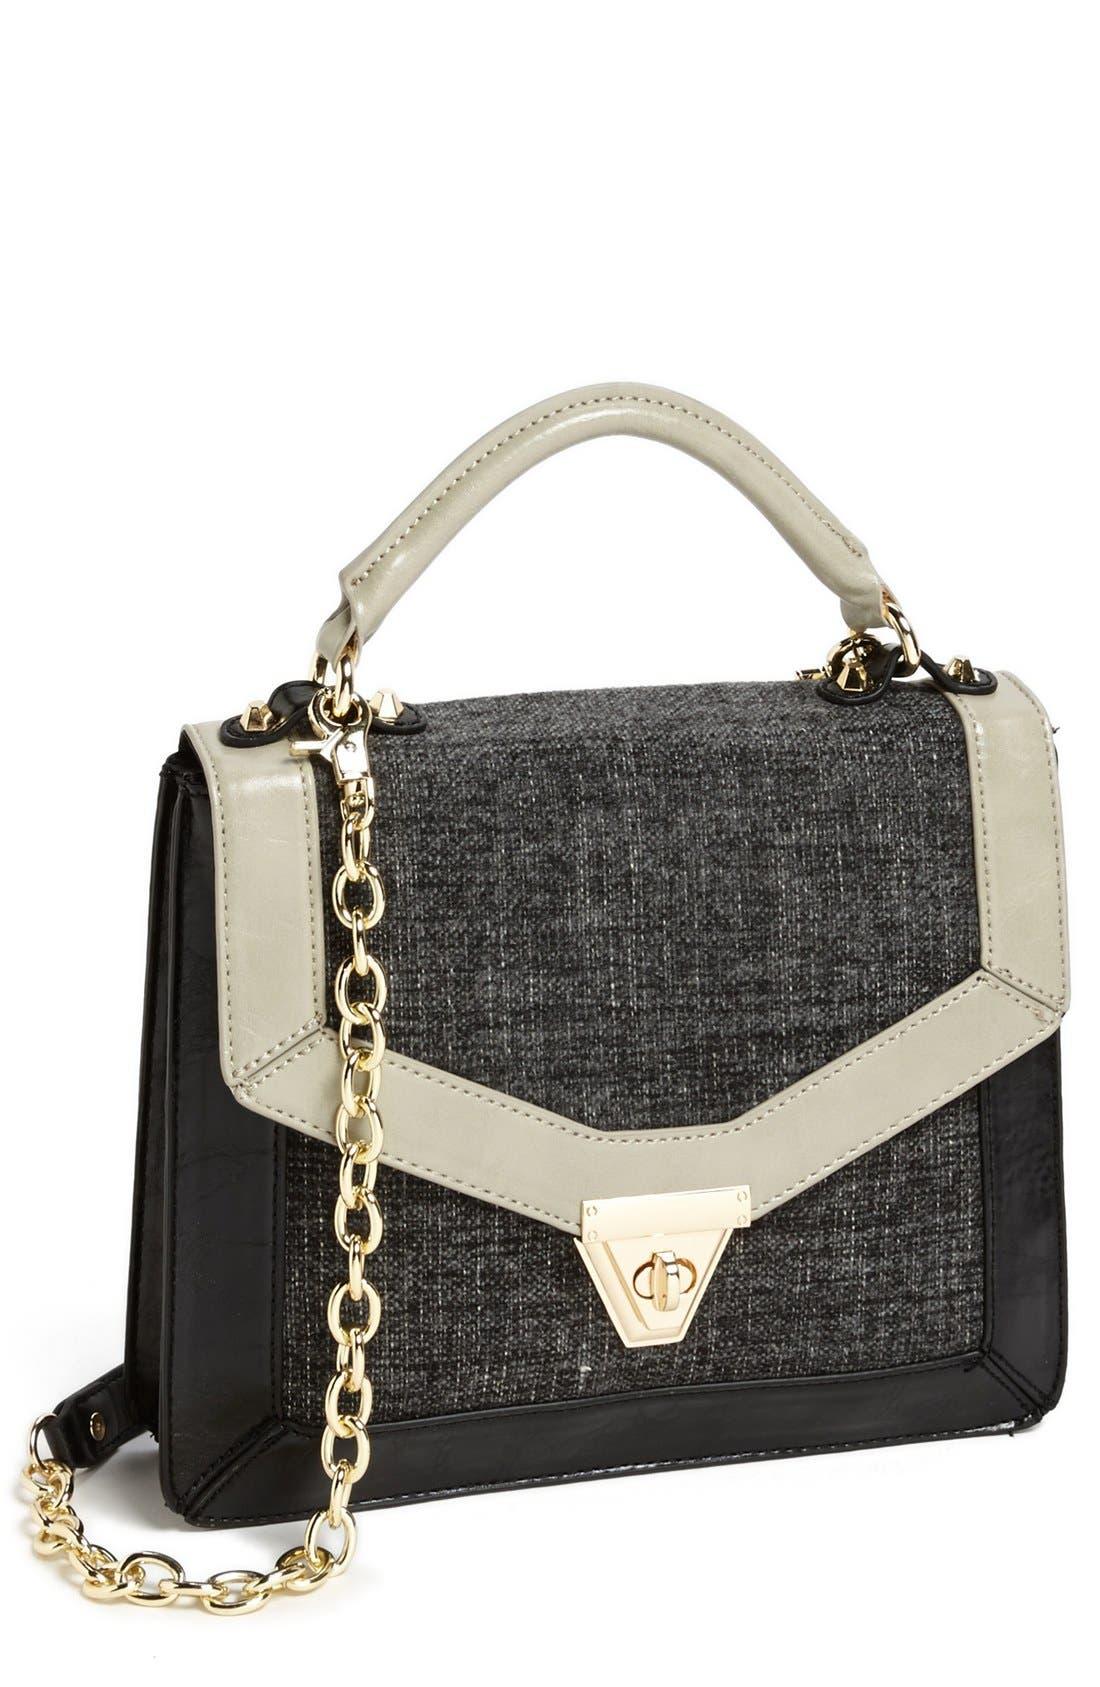 Main Image - Sole Society 'Medium Eloise' Shoulder Bag